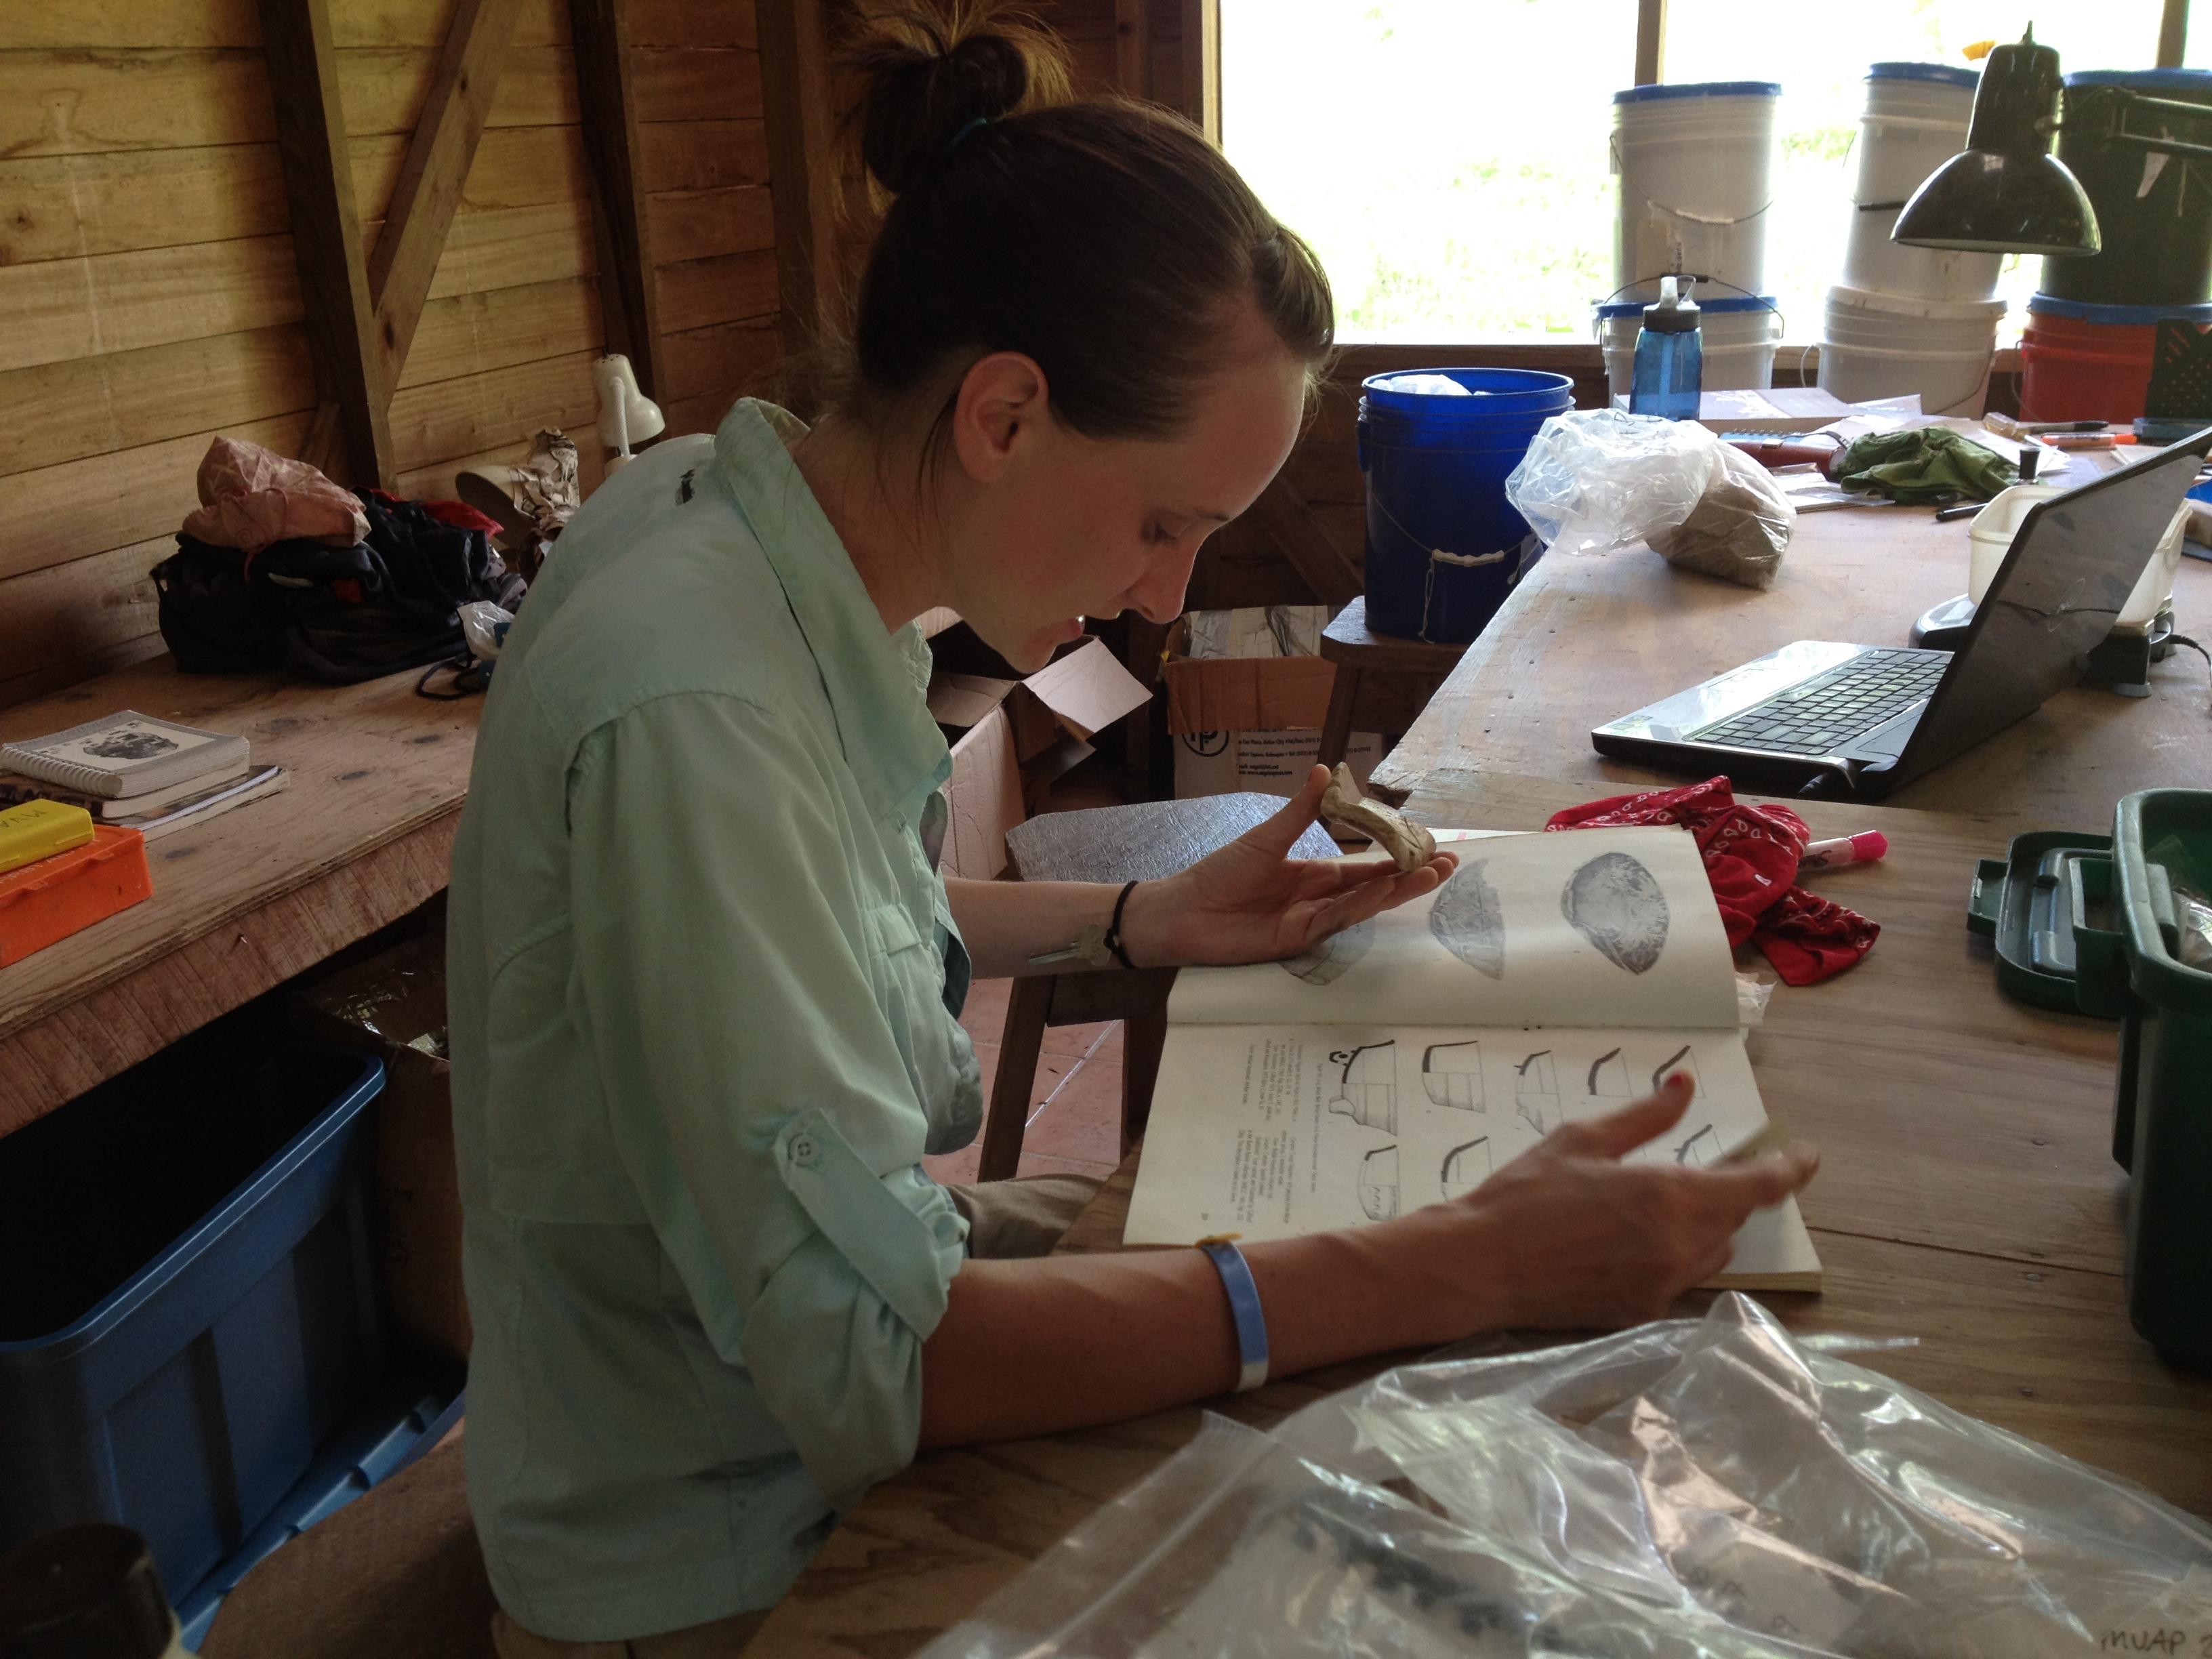 Christy classifying pottery shards